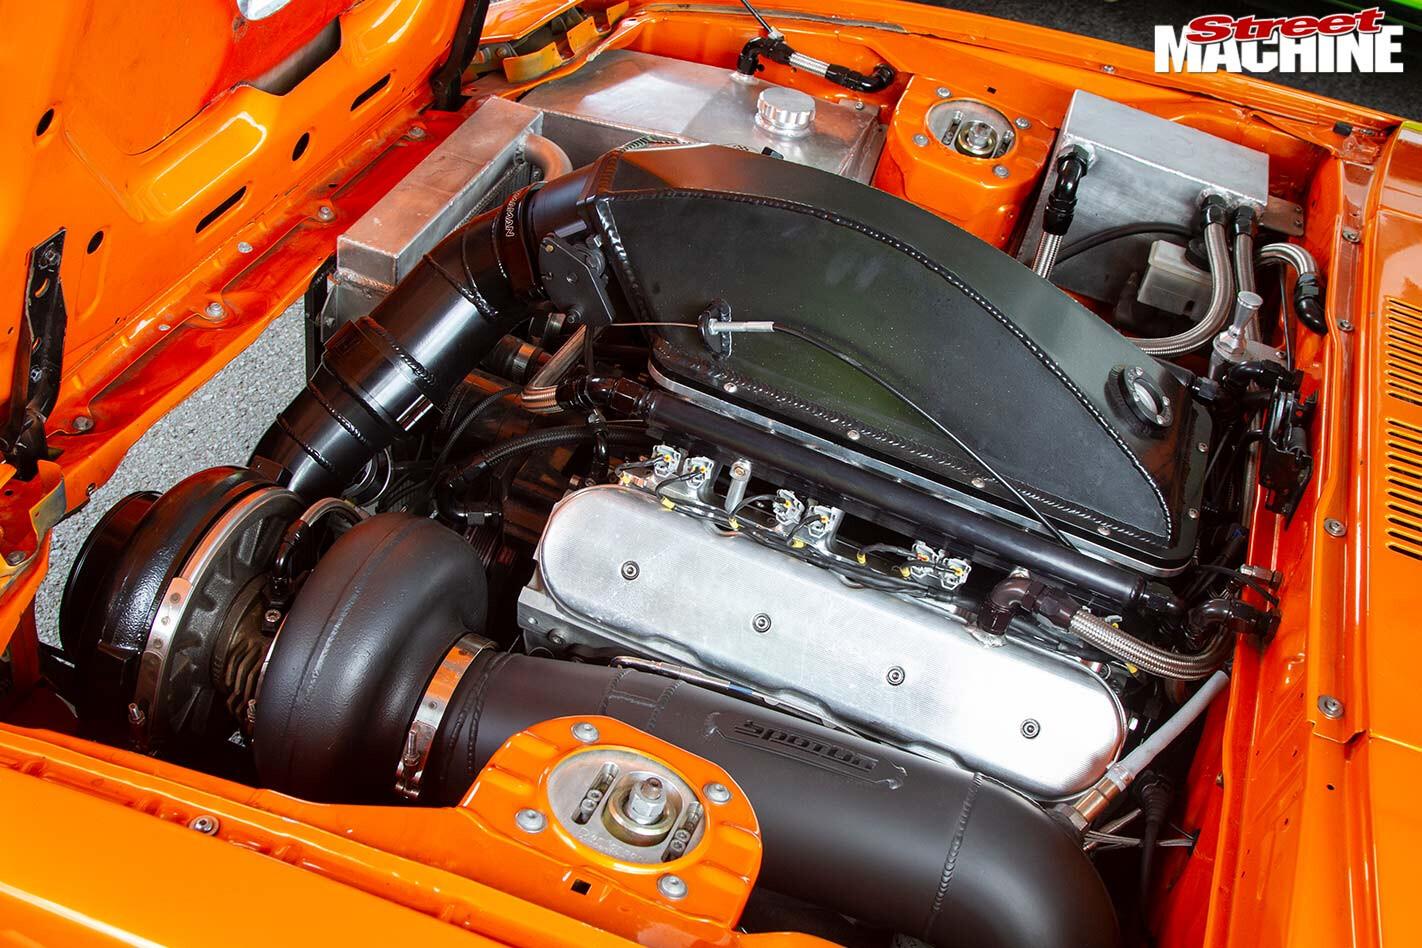 Mazda RX-7 engine bay